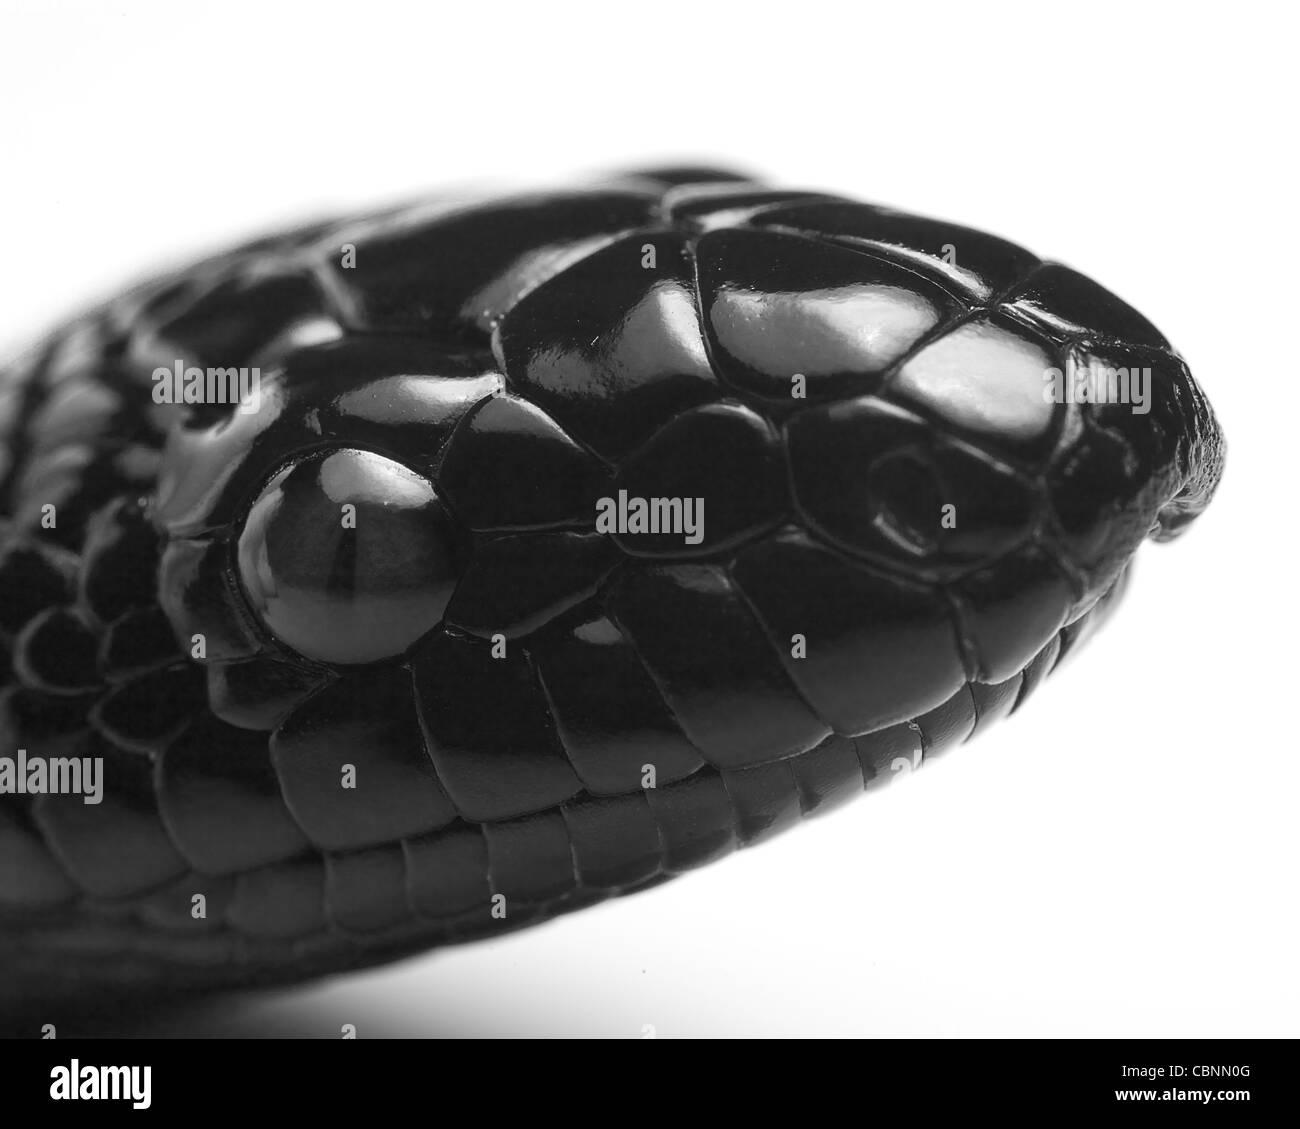 Cabeza negra juvenil python Imagen De Stock